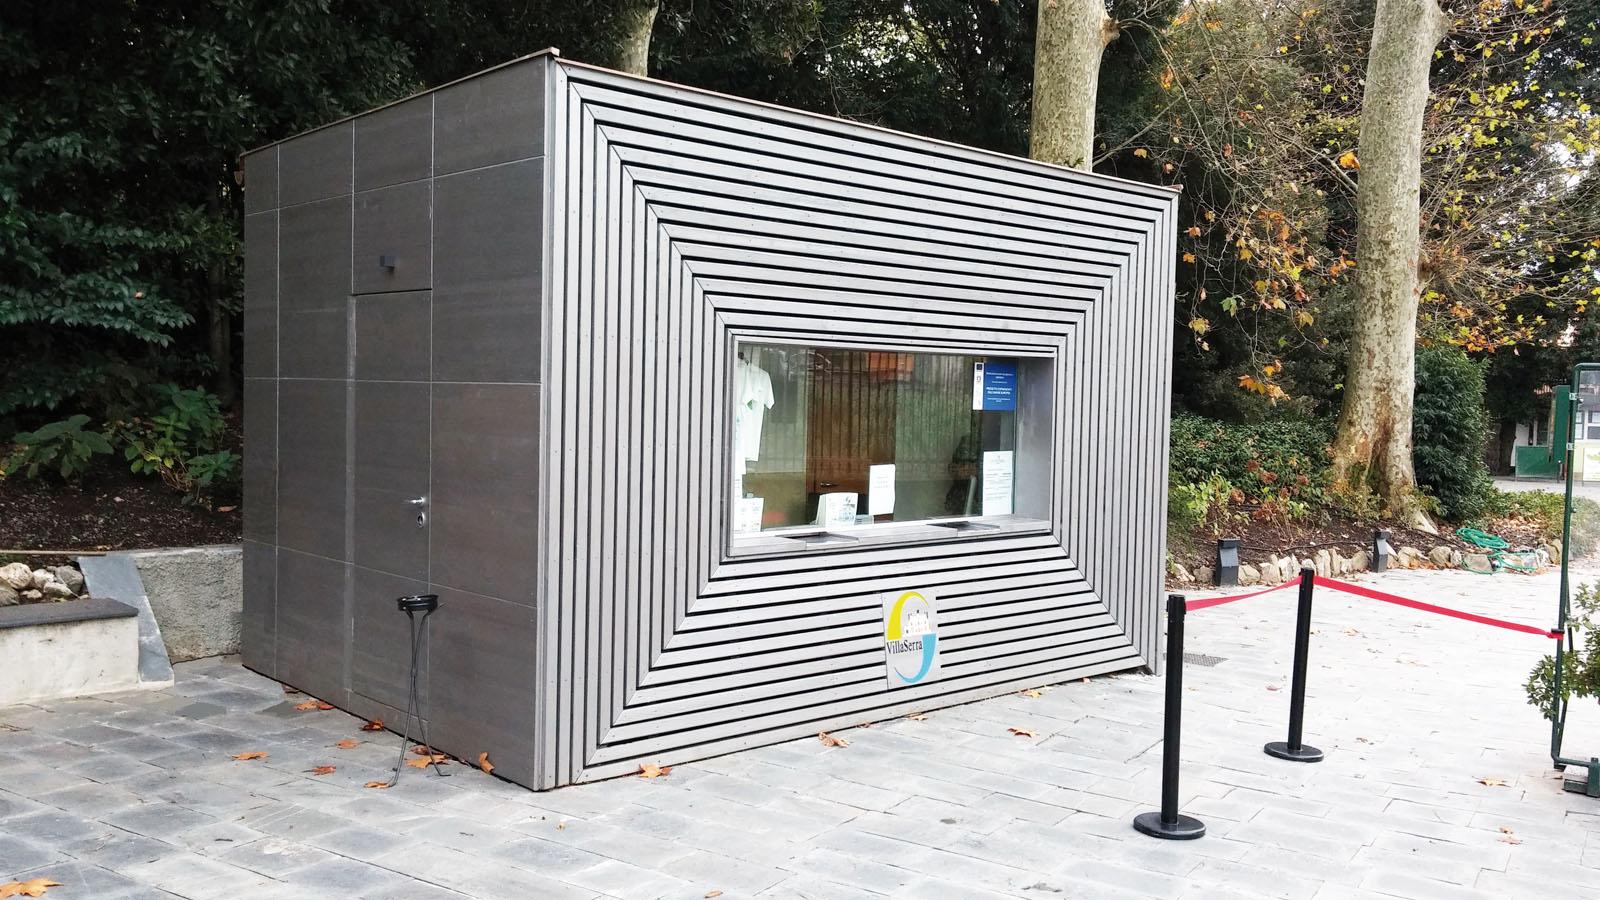 La casa prefabbricata a risparmio energetico c g tetti - Risparmio energetico casa ...